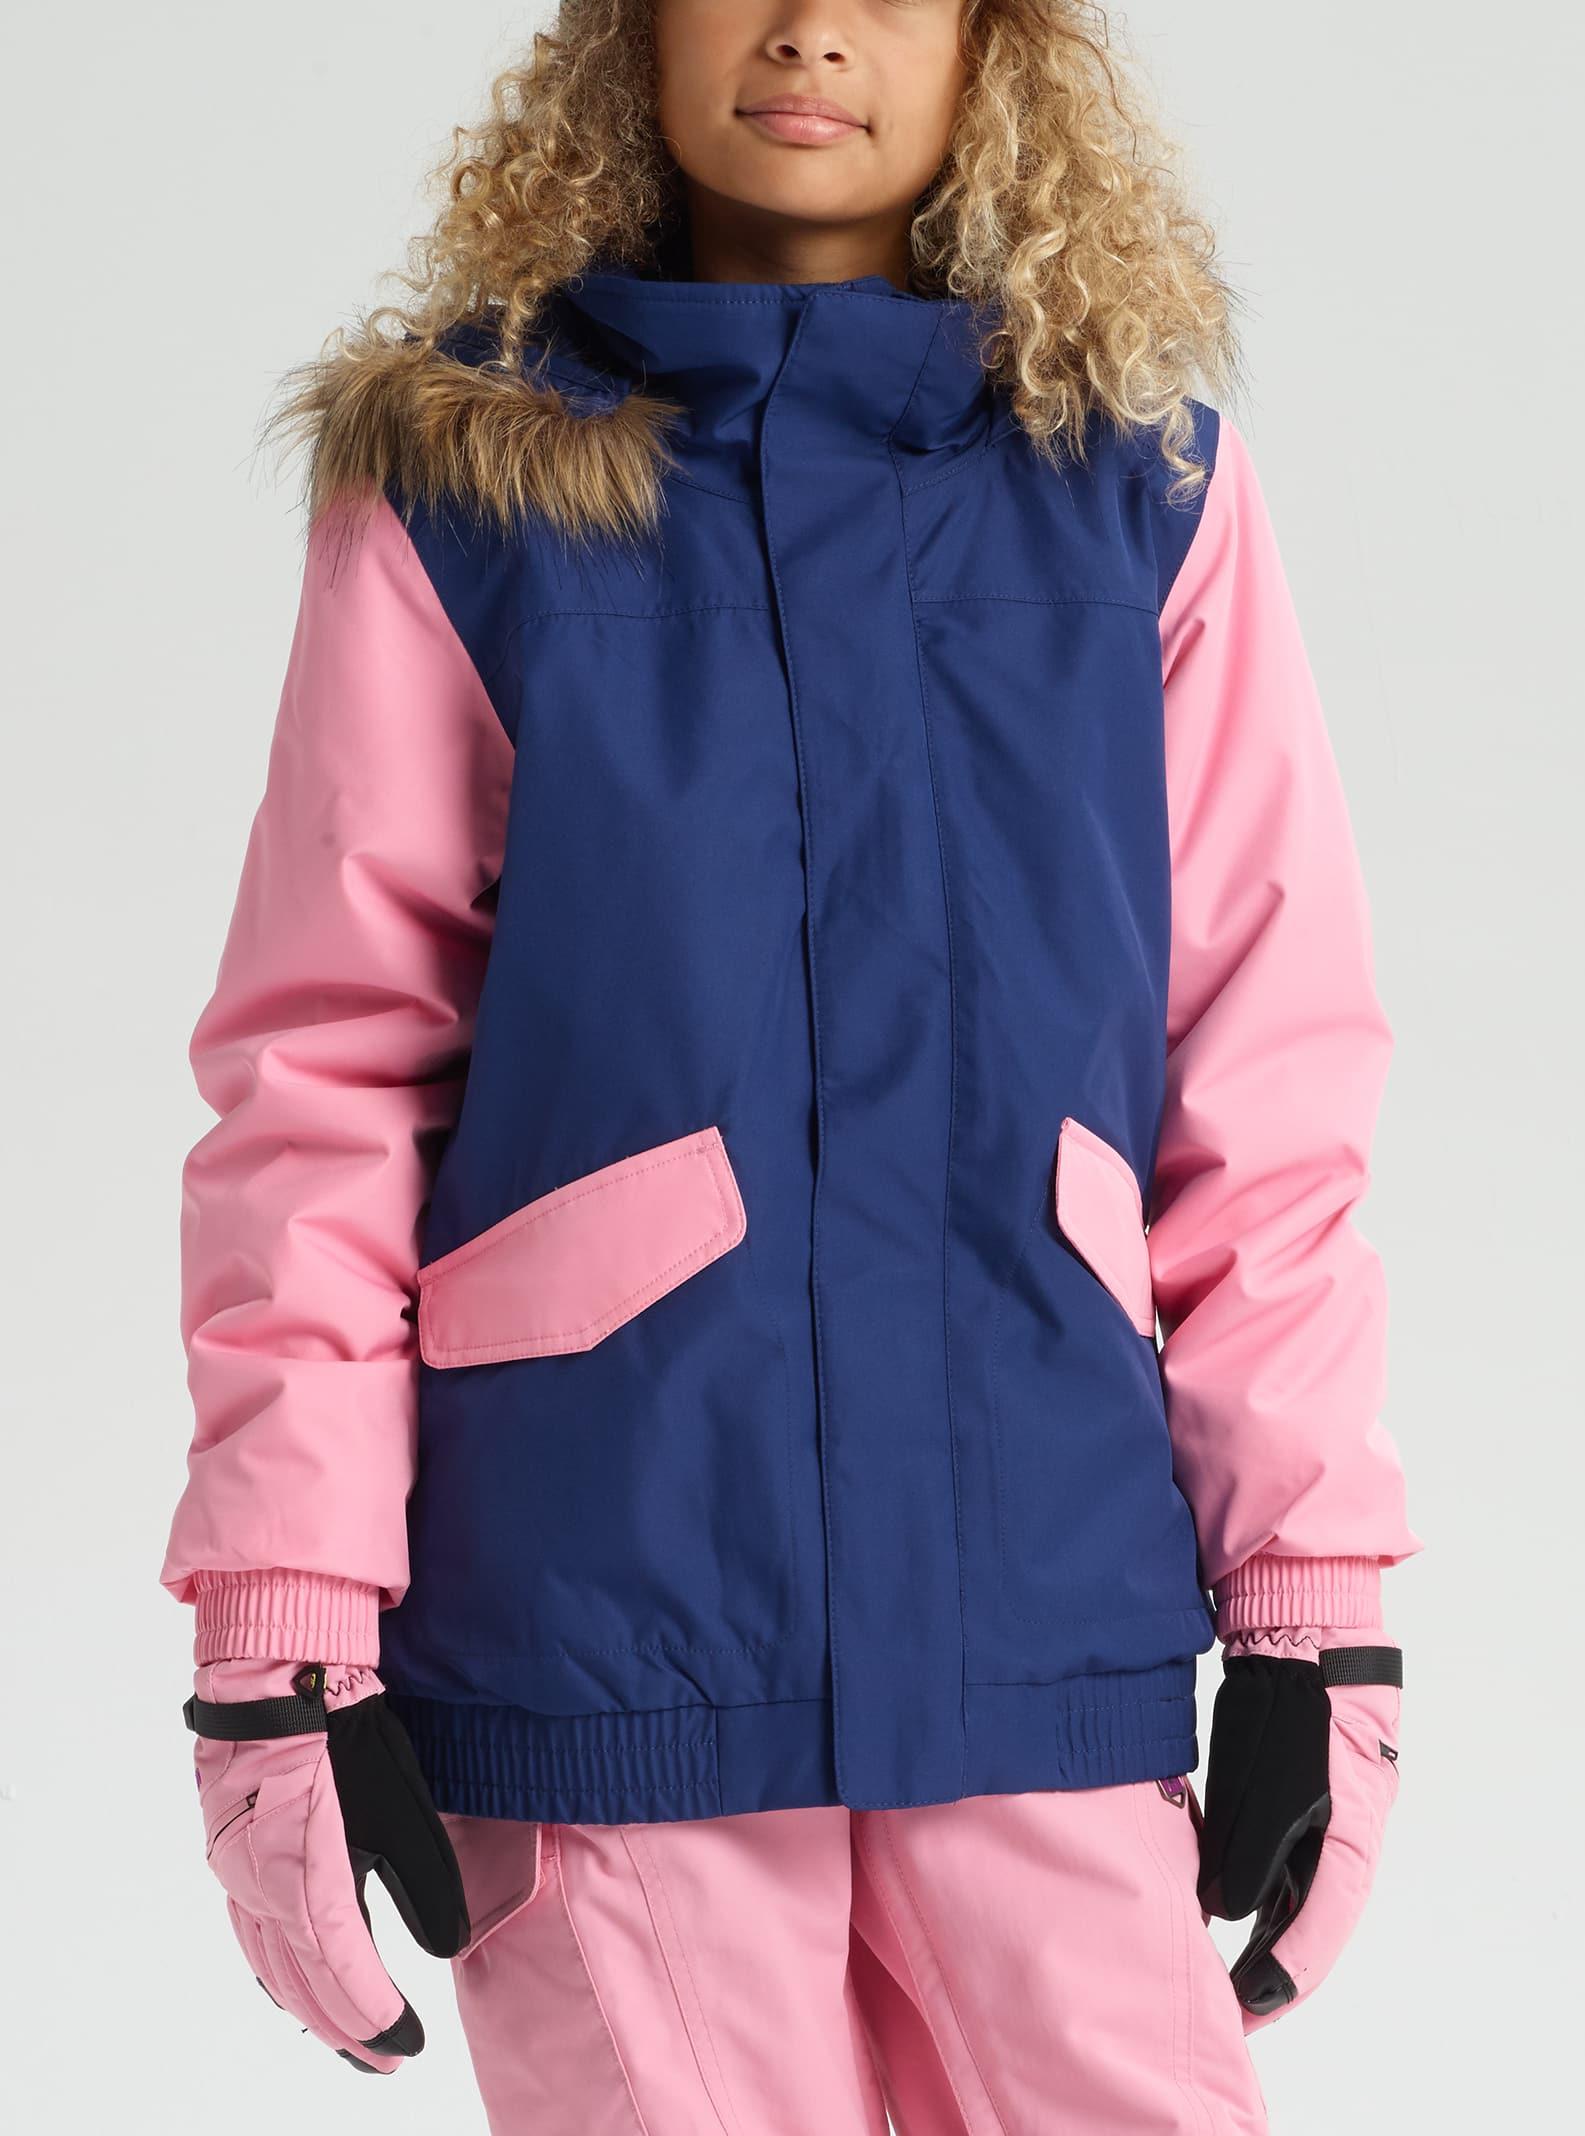 5cc24a9bd929 Kids  Snowboard Jackets